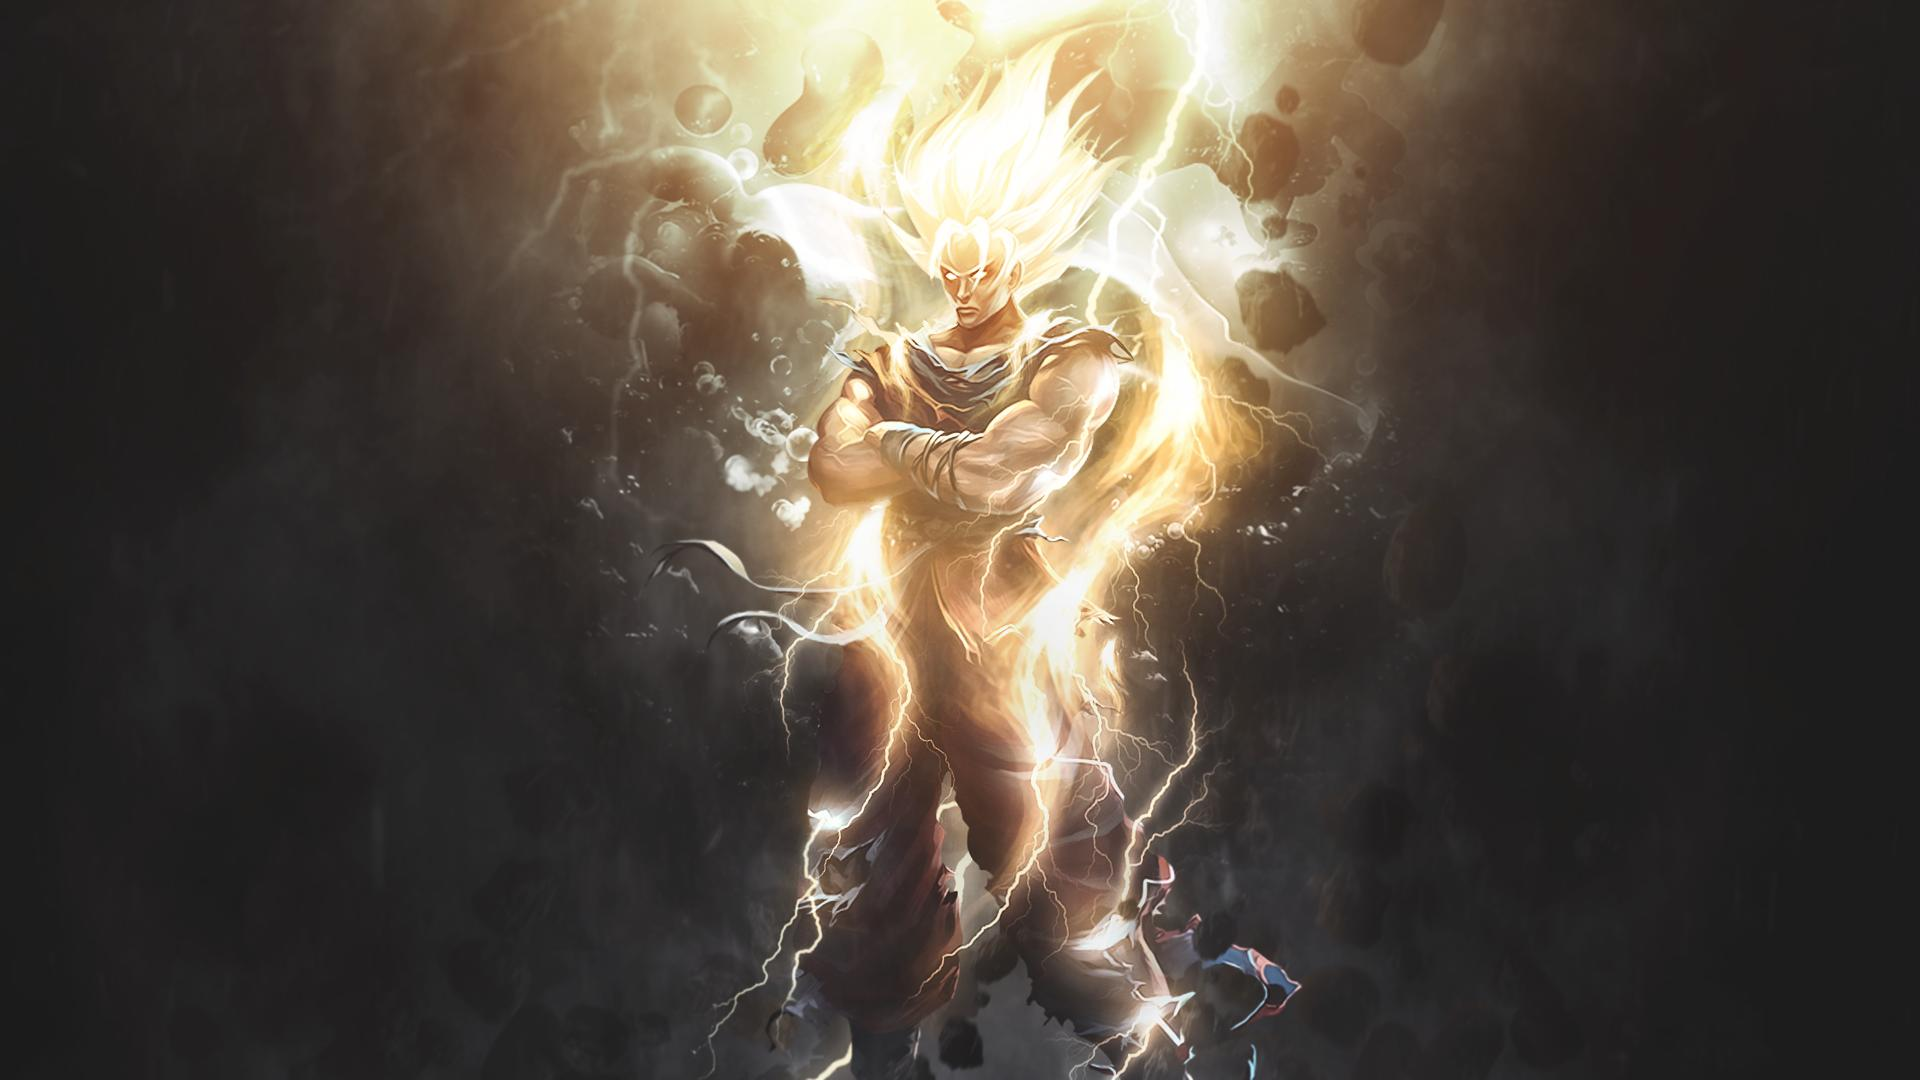 Goku Hd Wallpaper Background Image 1920x1080 Id